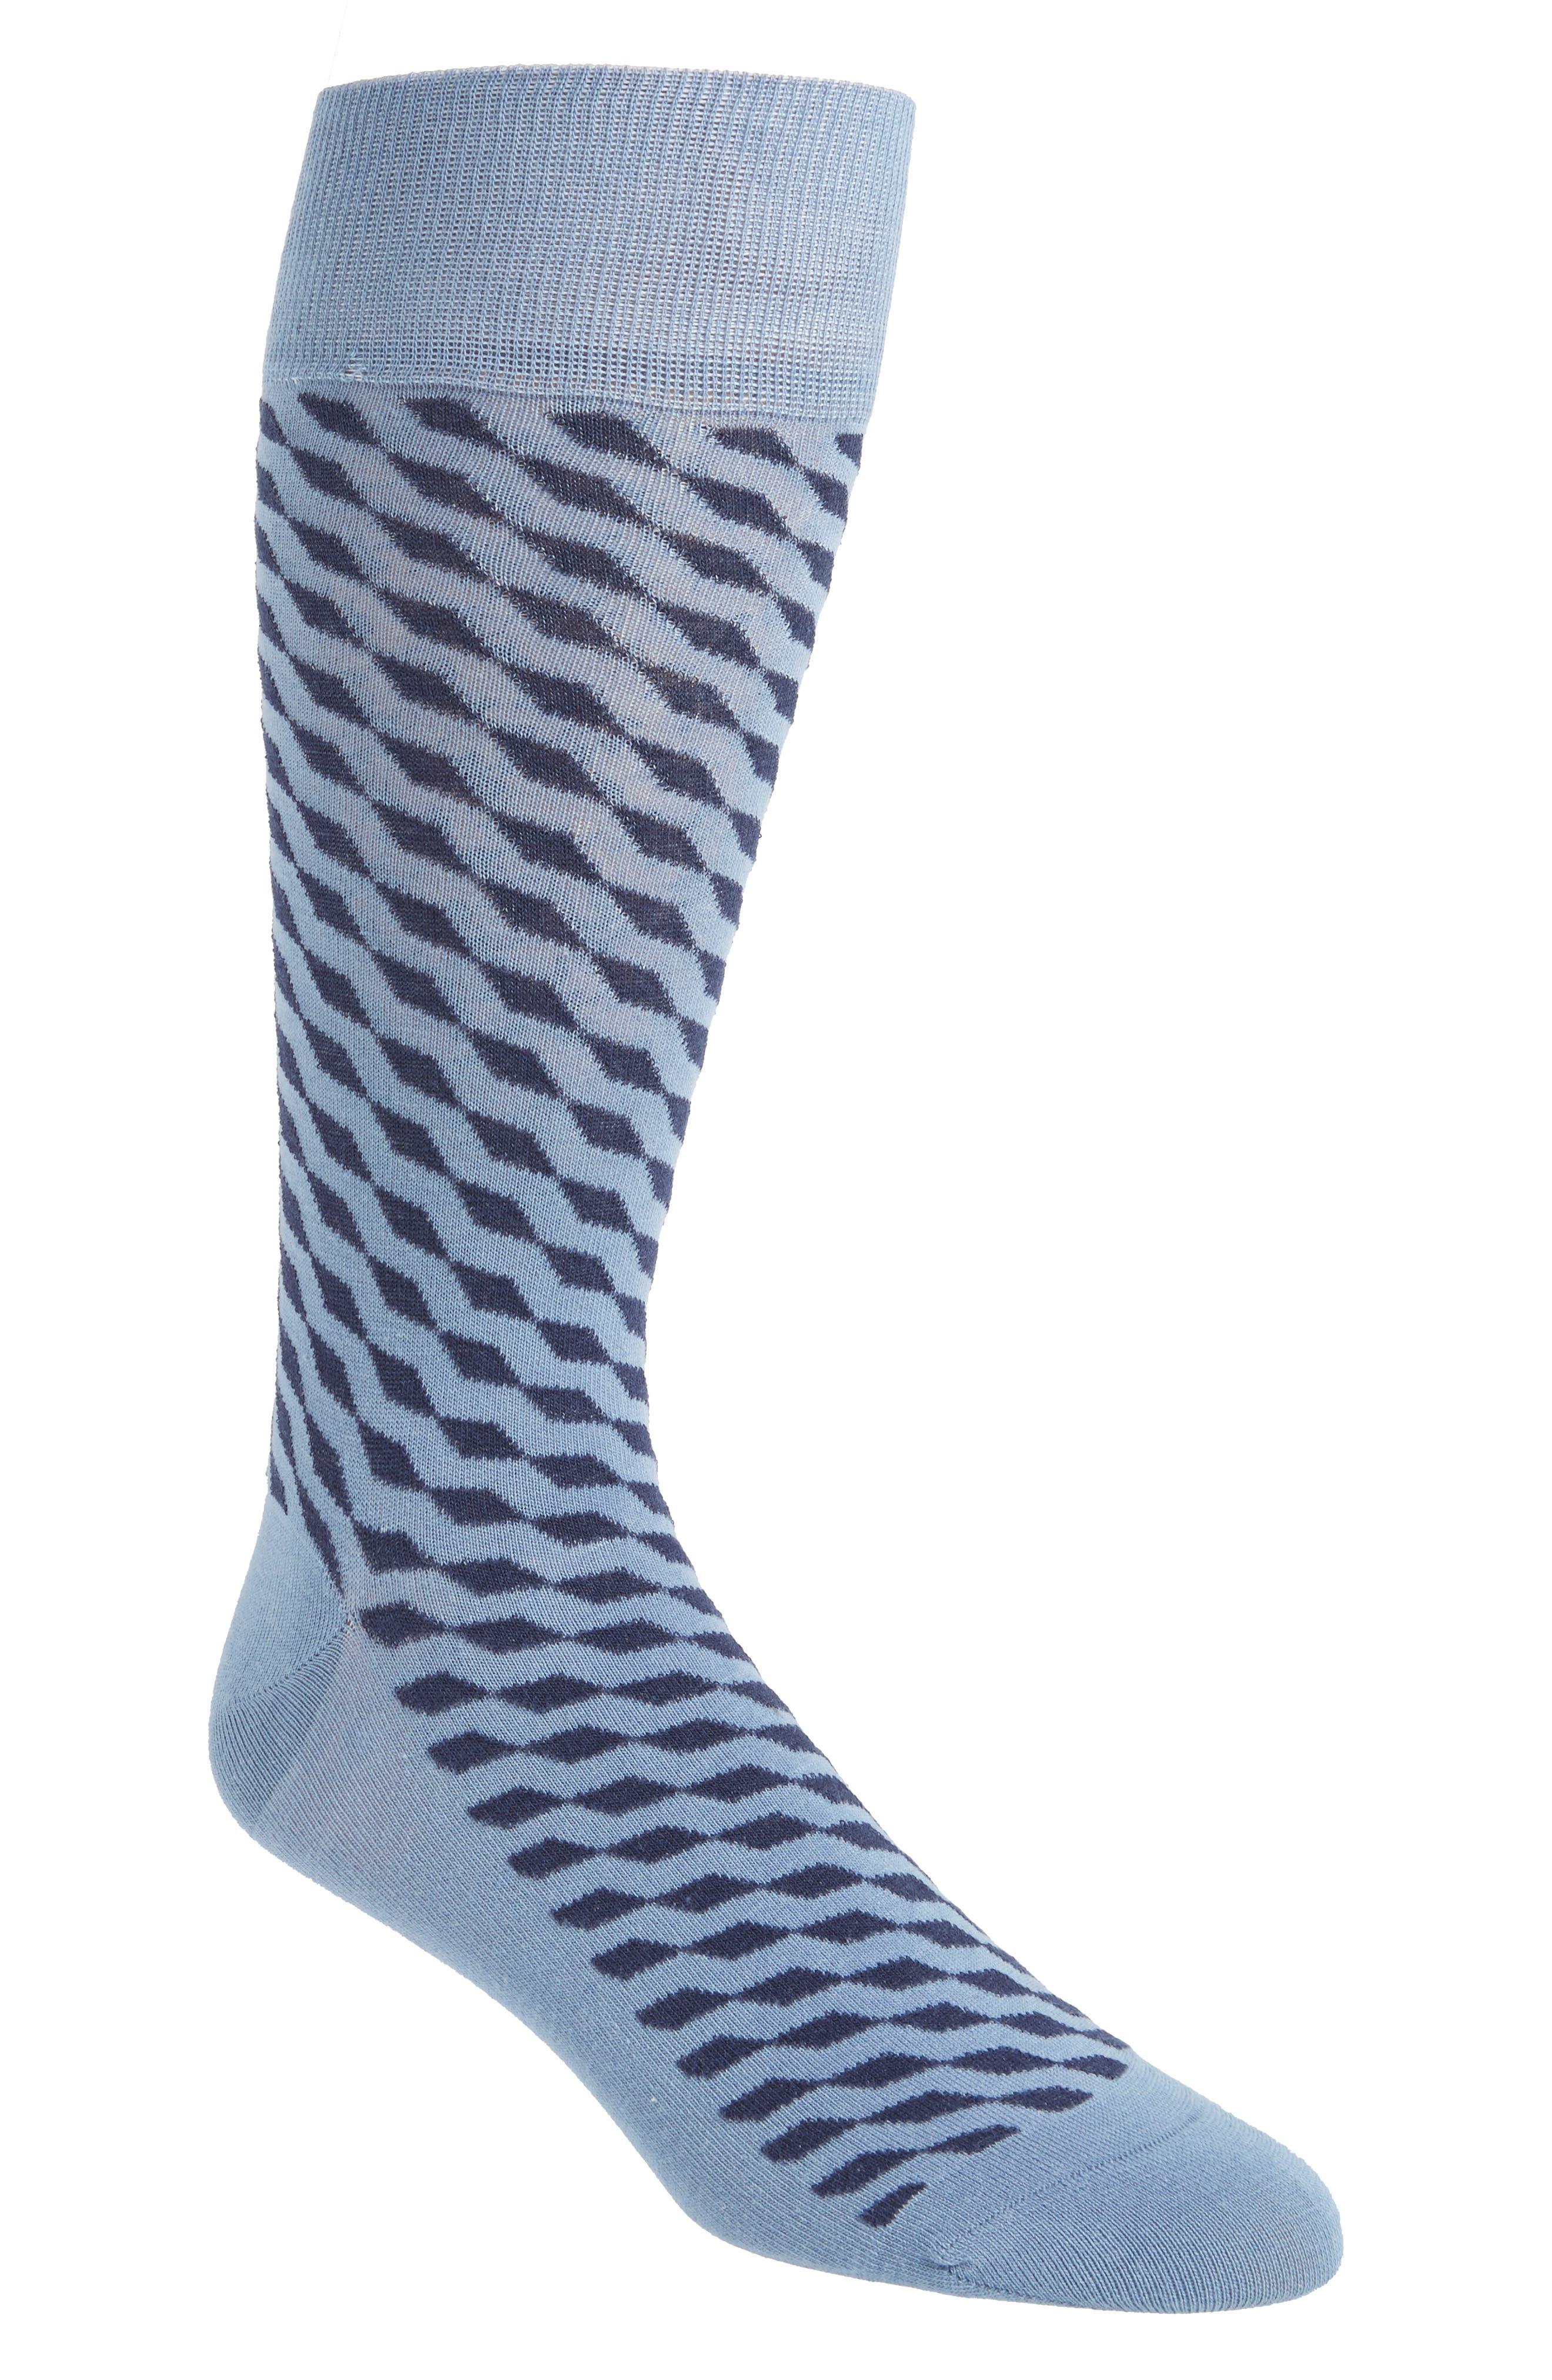 Cole Haan Diagonal Cube Socks